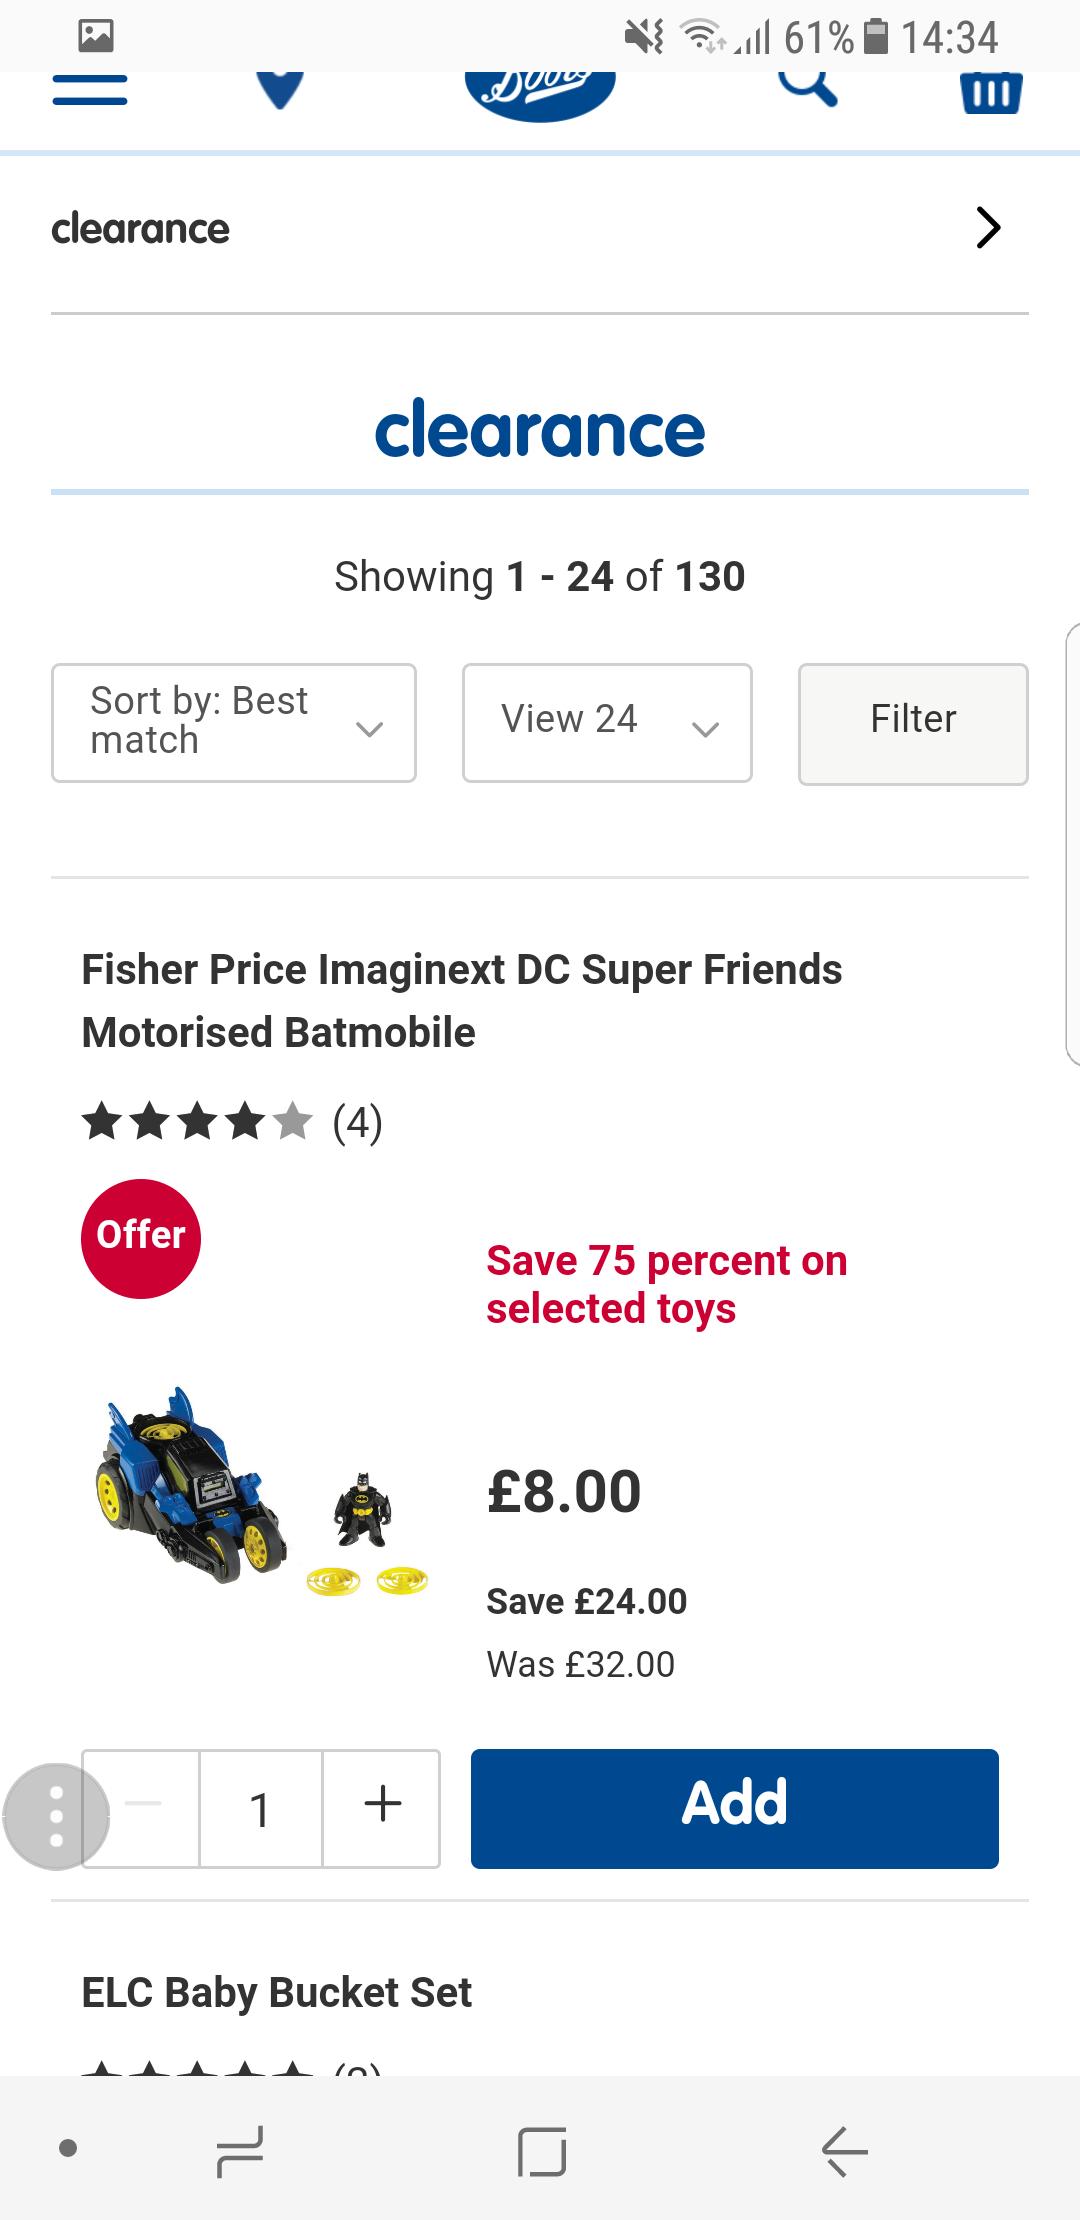 Imaginext motorised batmobile - £8 @ Boots